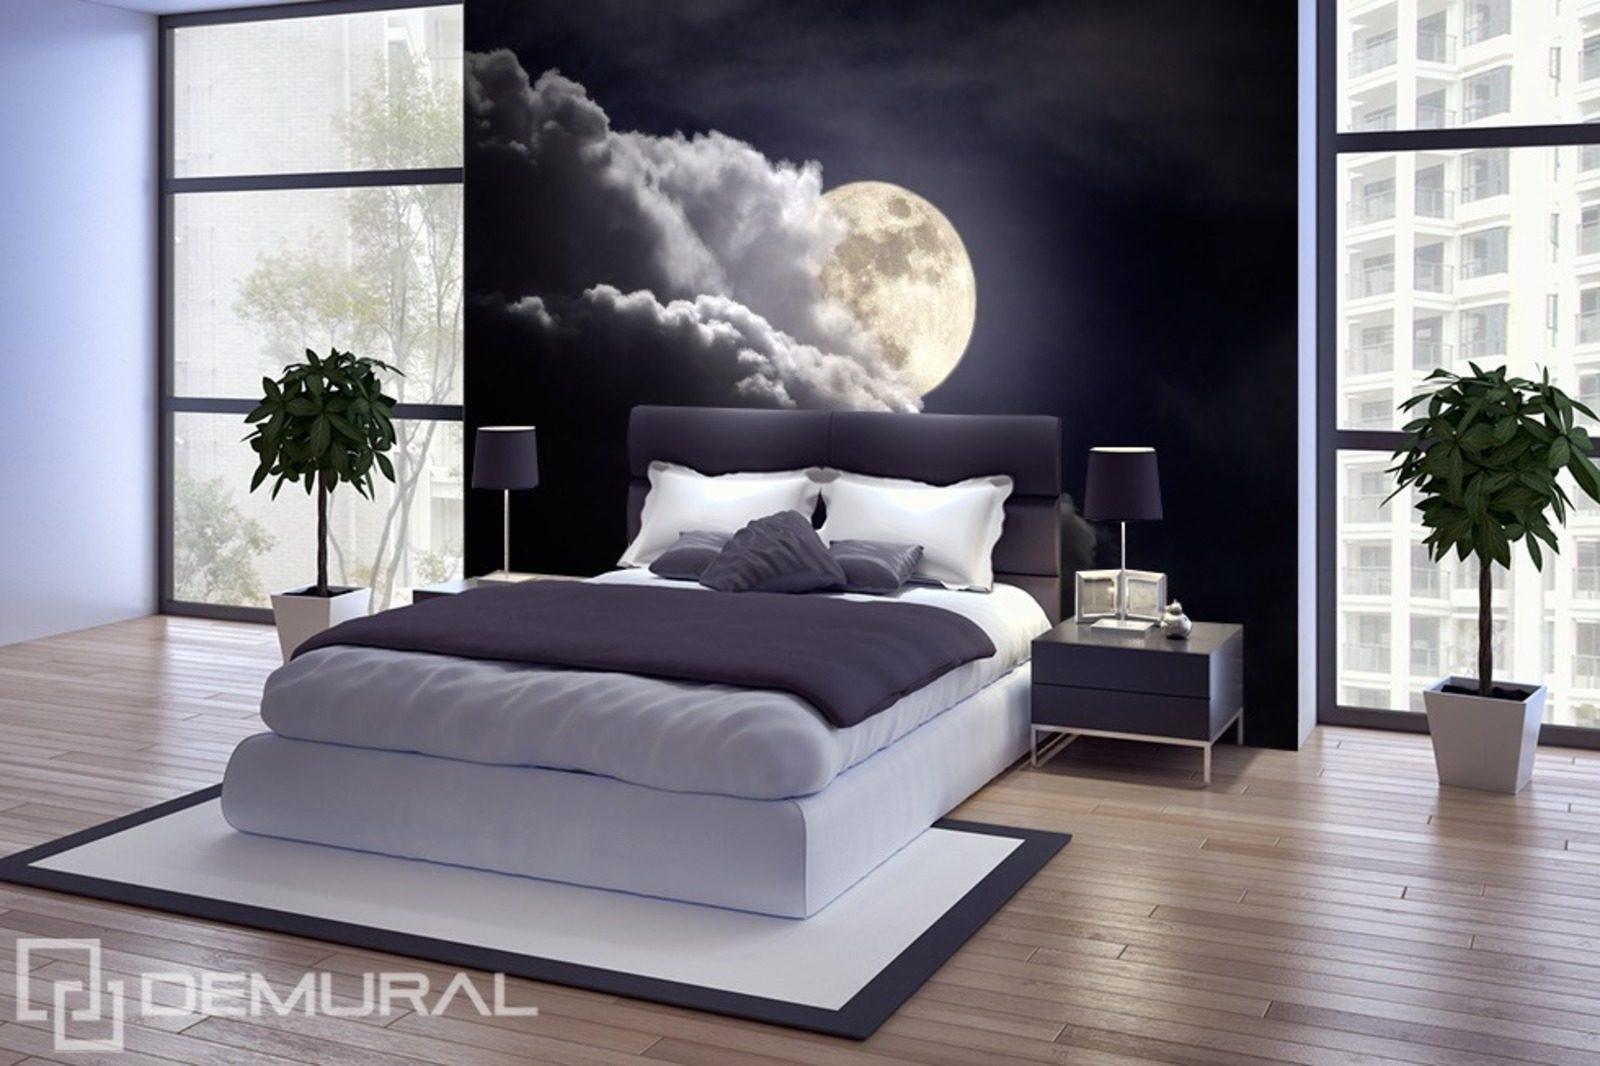 Fototapete Vlies Mond - Tapete Tapeten Fototapeten Für Schlafzimmer ...